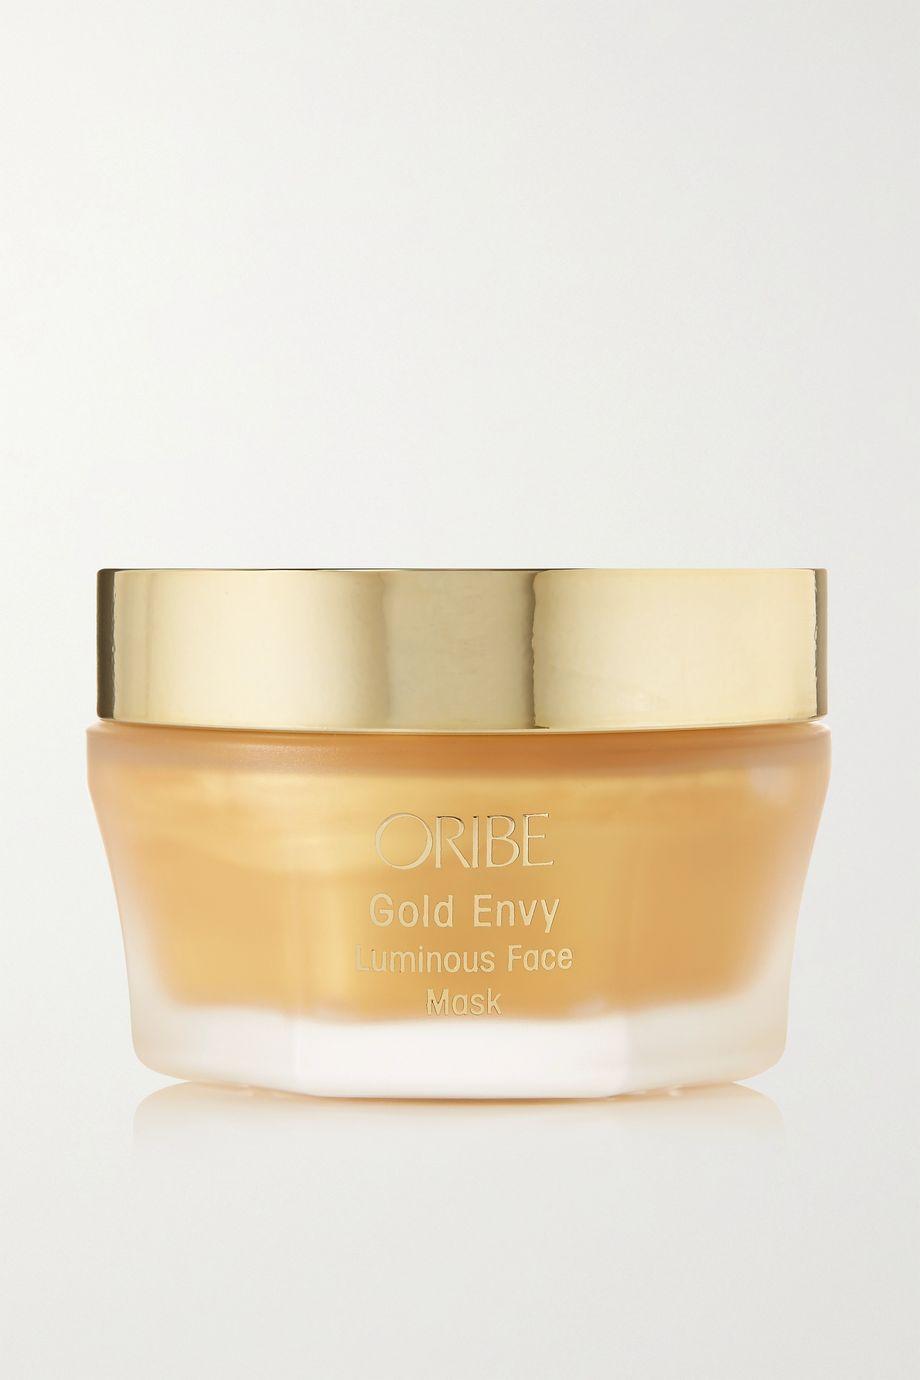 Oribe Gold Envy Luminous Face Mask, 50ml